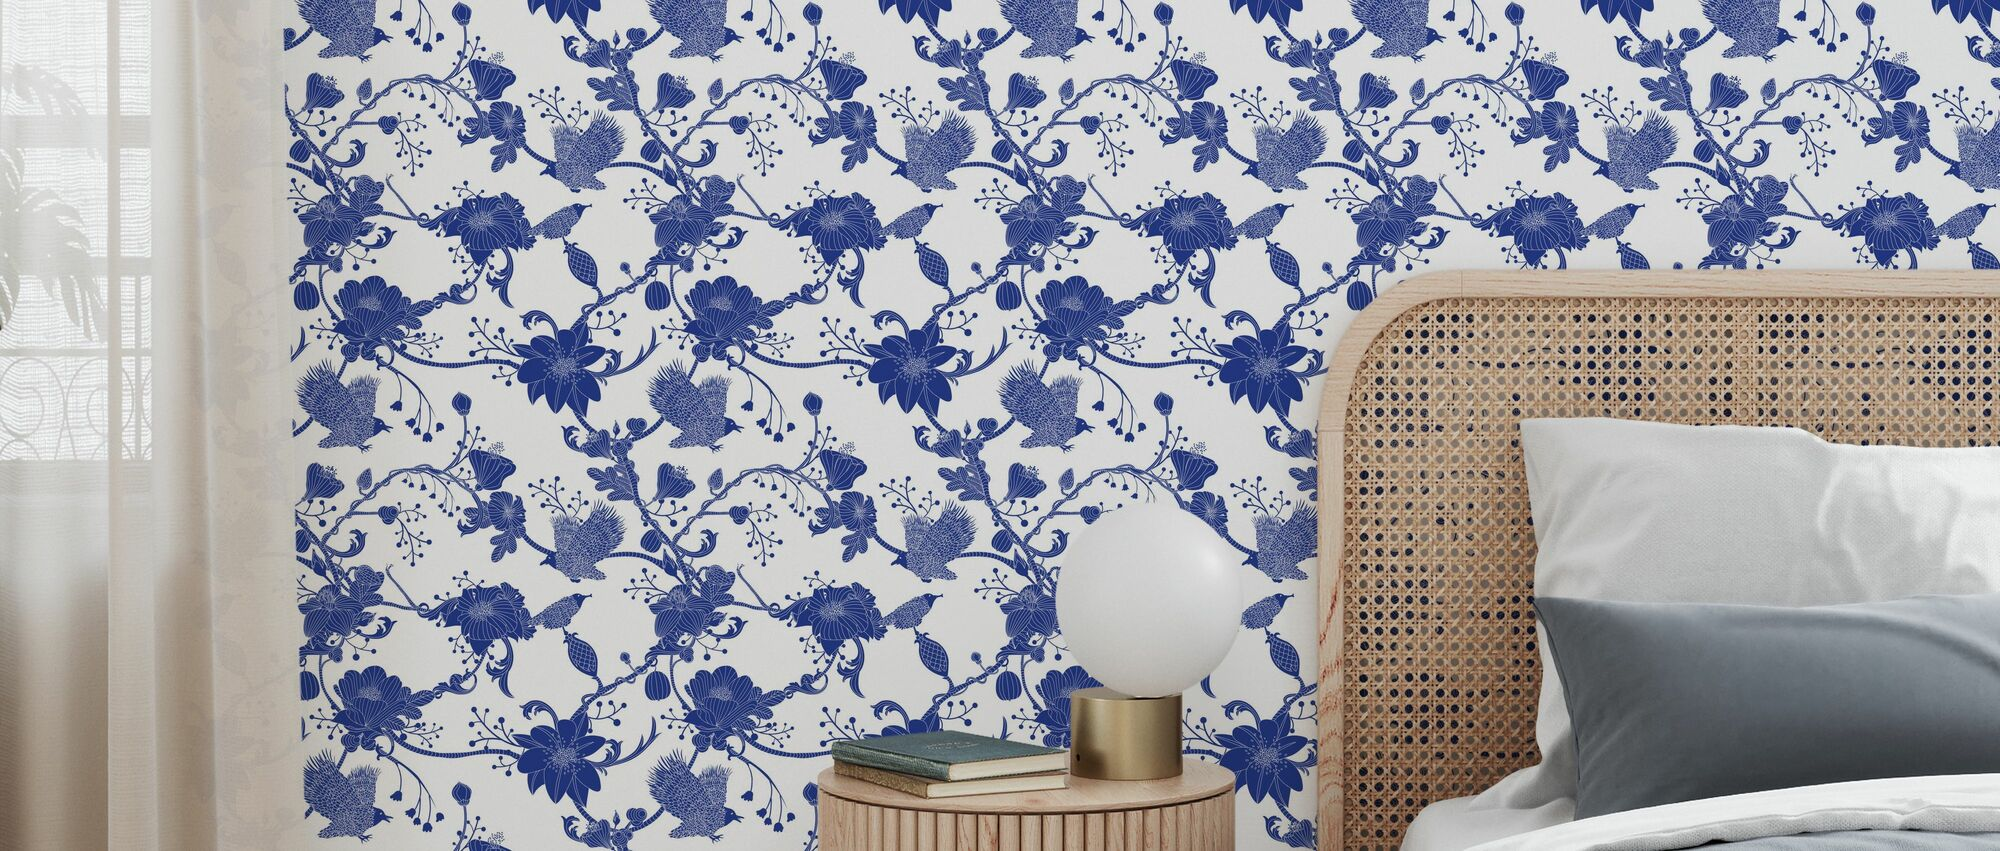 Botanica - Blue - Behang - Slaapkamer